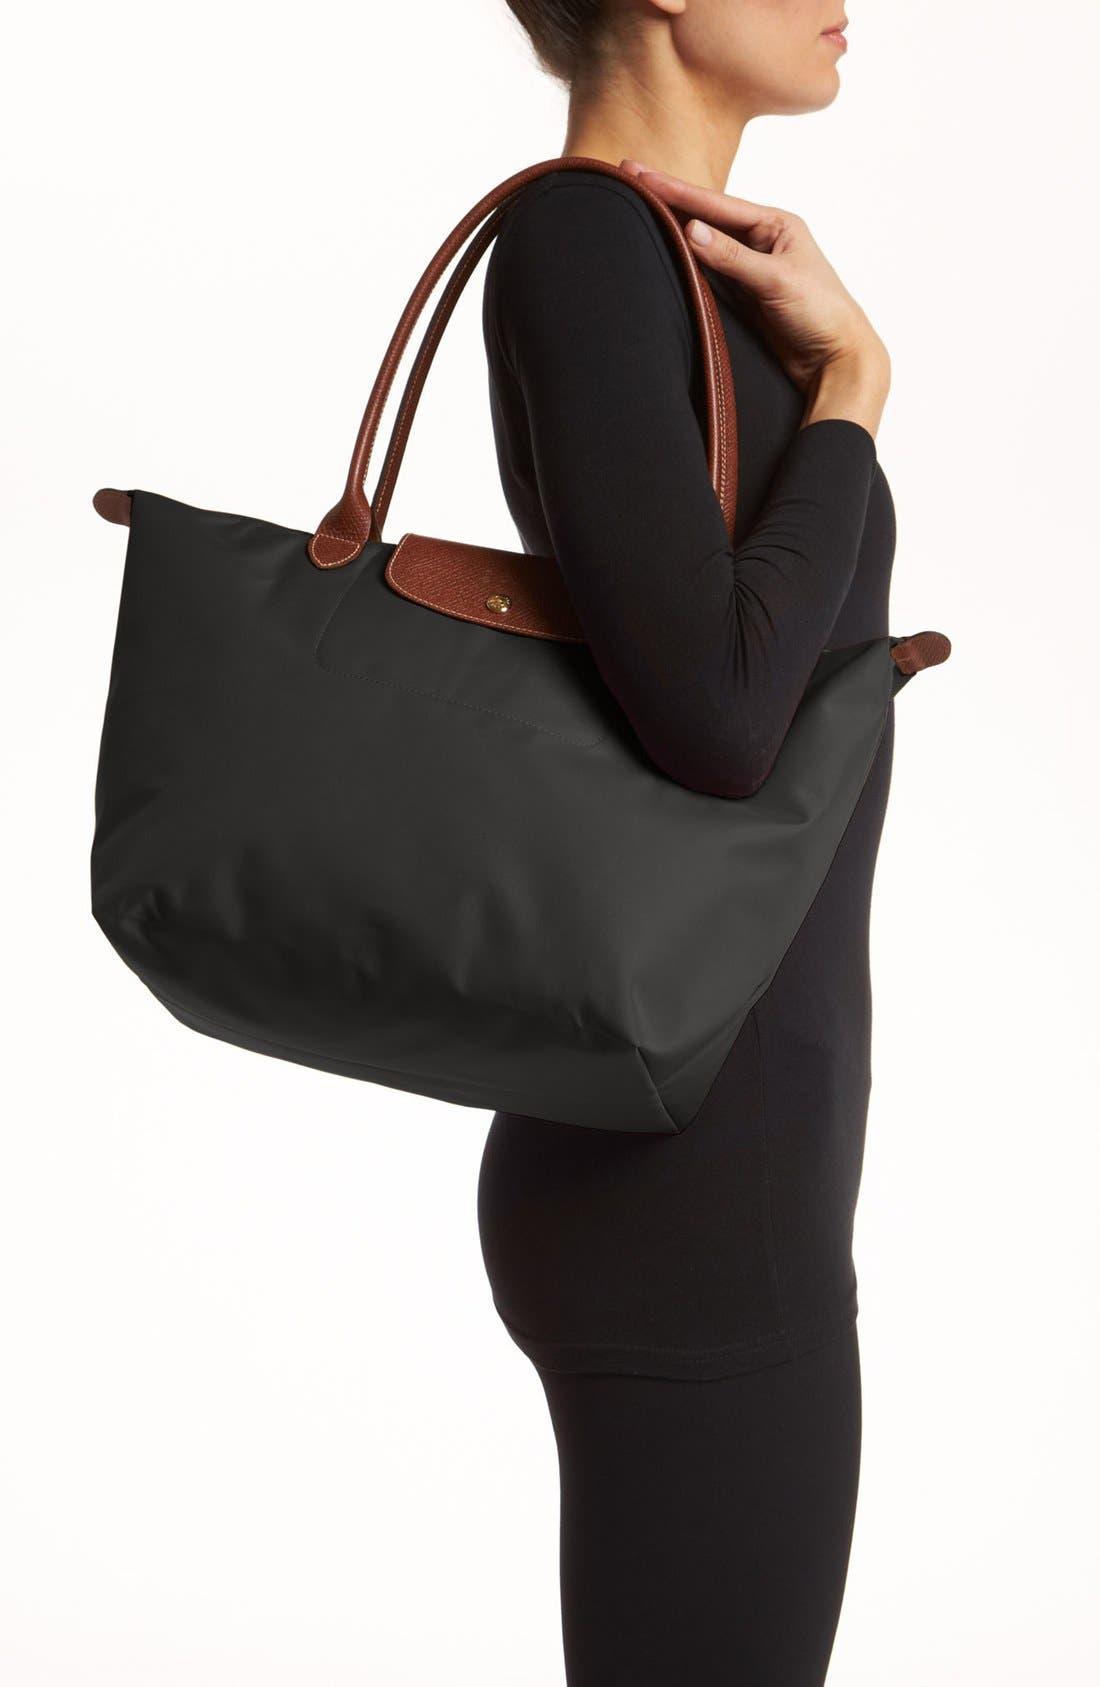 822b3cf51bc64 Handbags   Wallets for Women